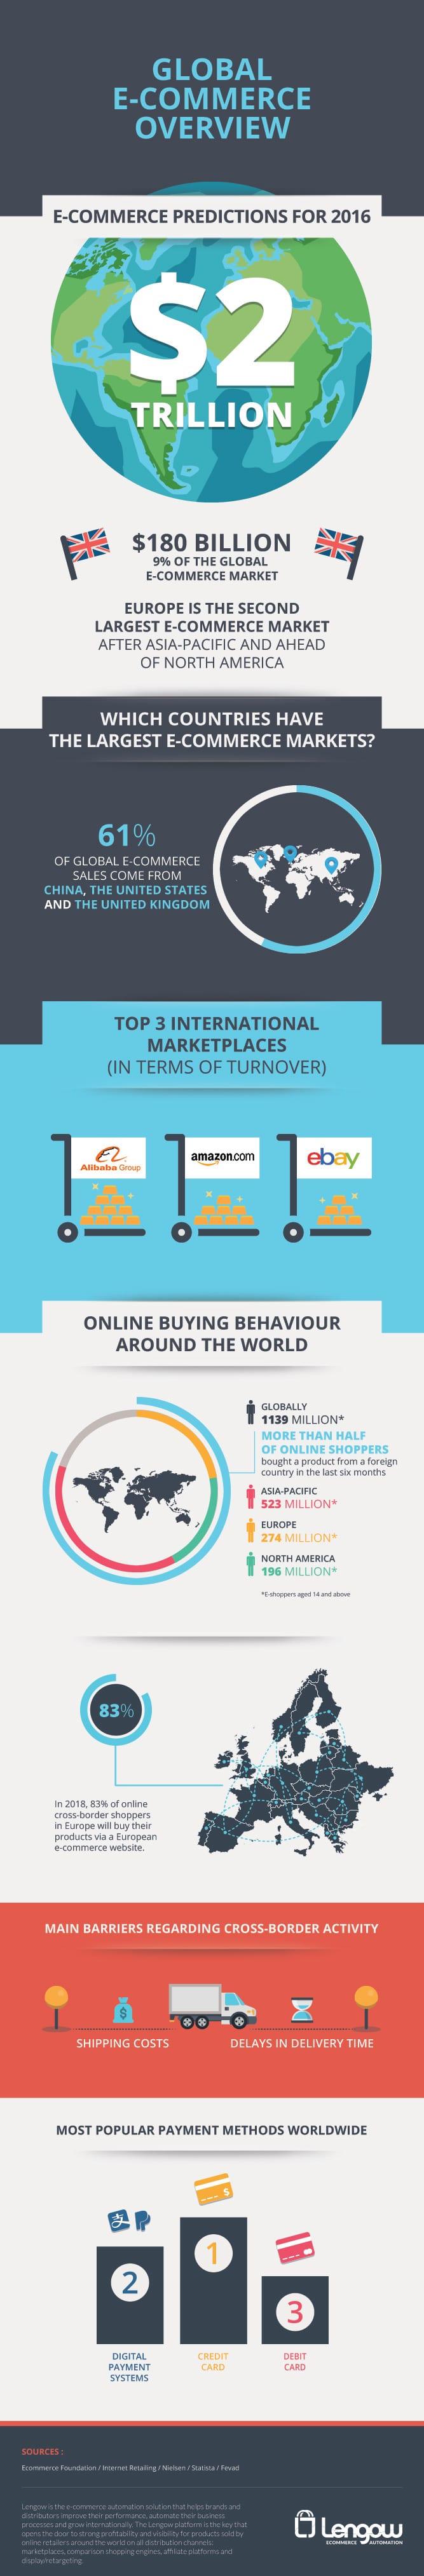 infographie_ecommerce_monde_2016_UK